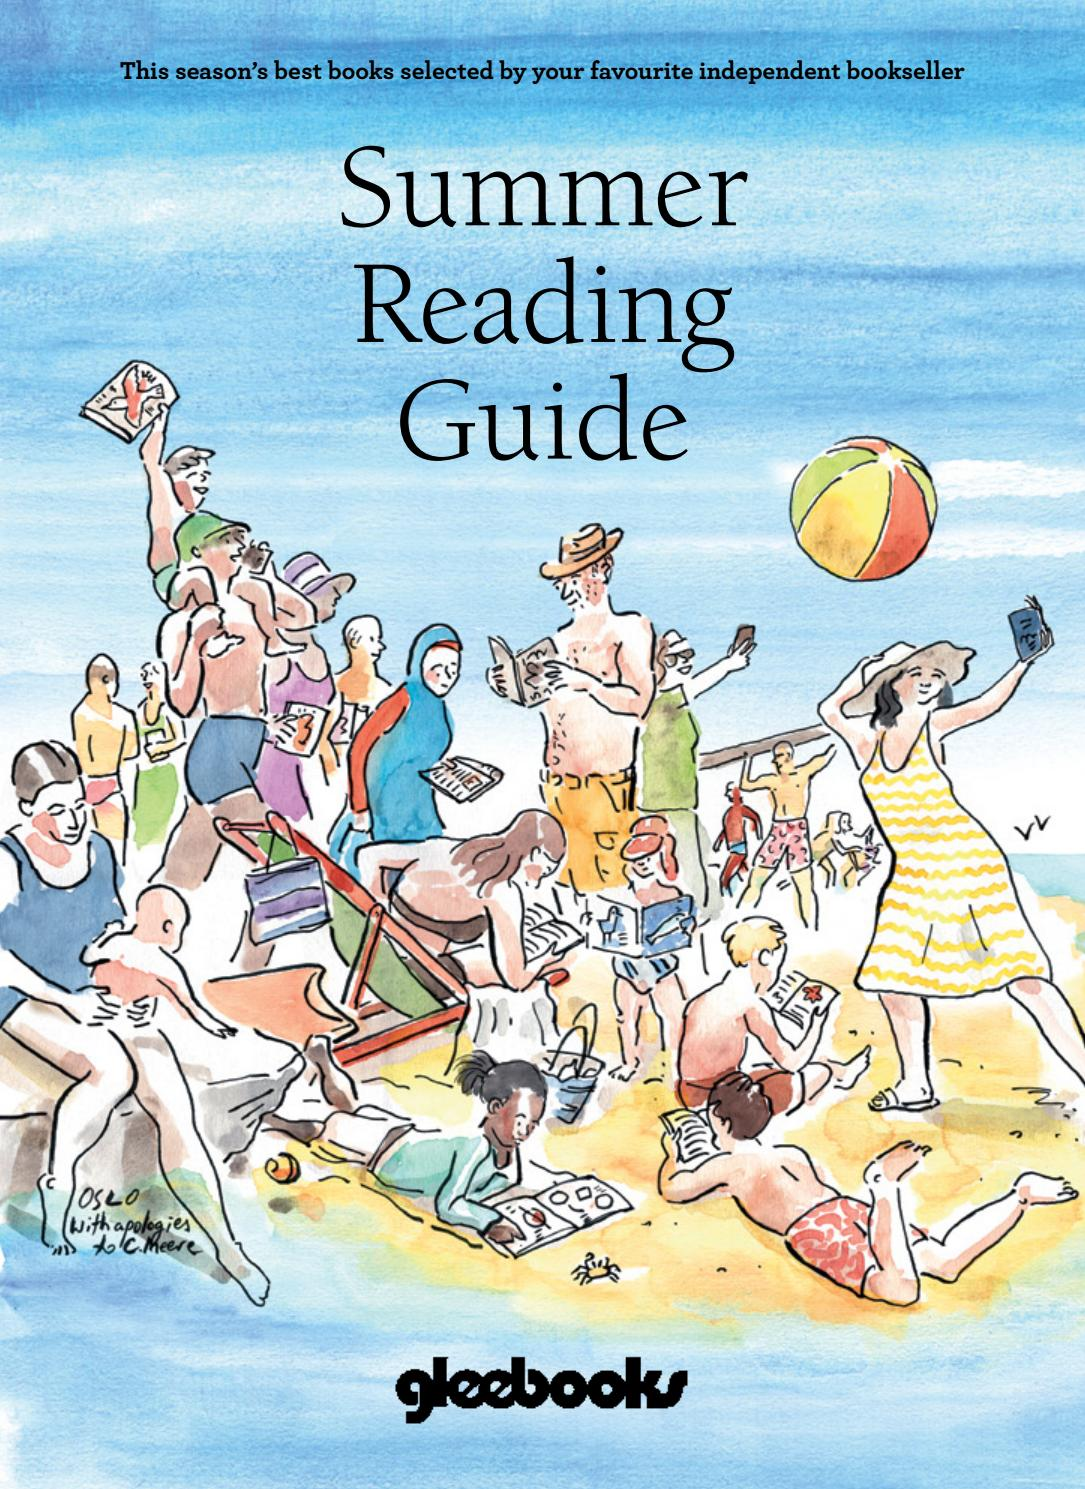 Gleebooks Summer Reading Guide 2017 by Gleebooks - issuu